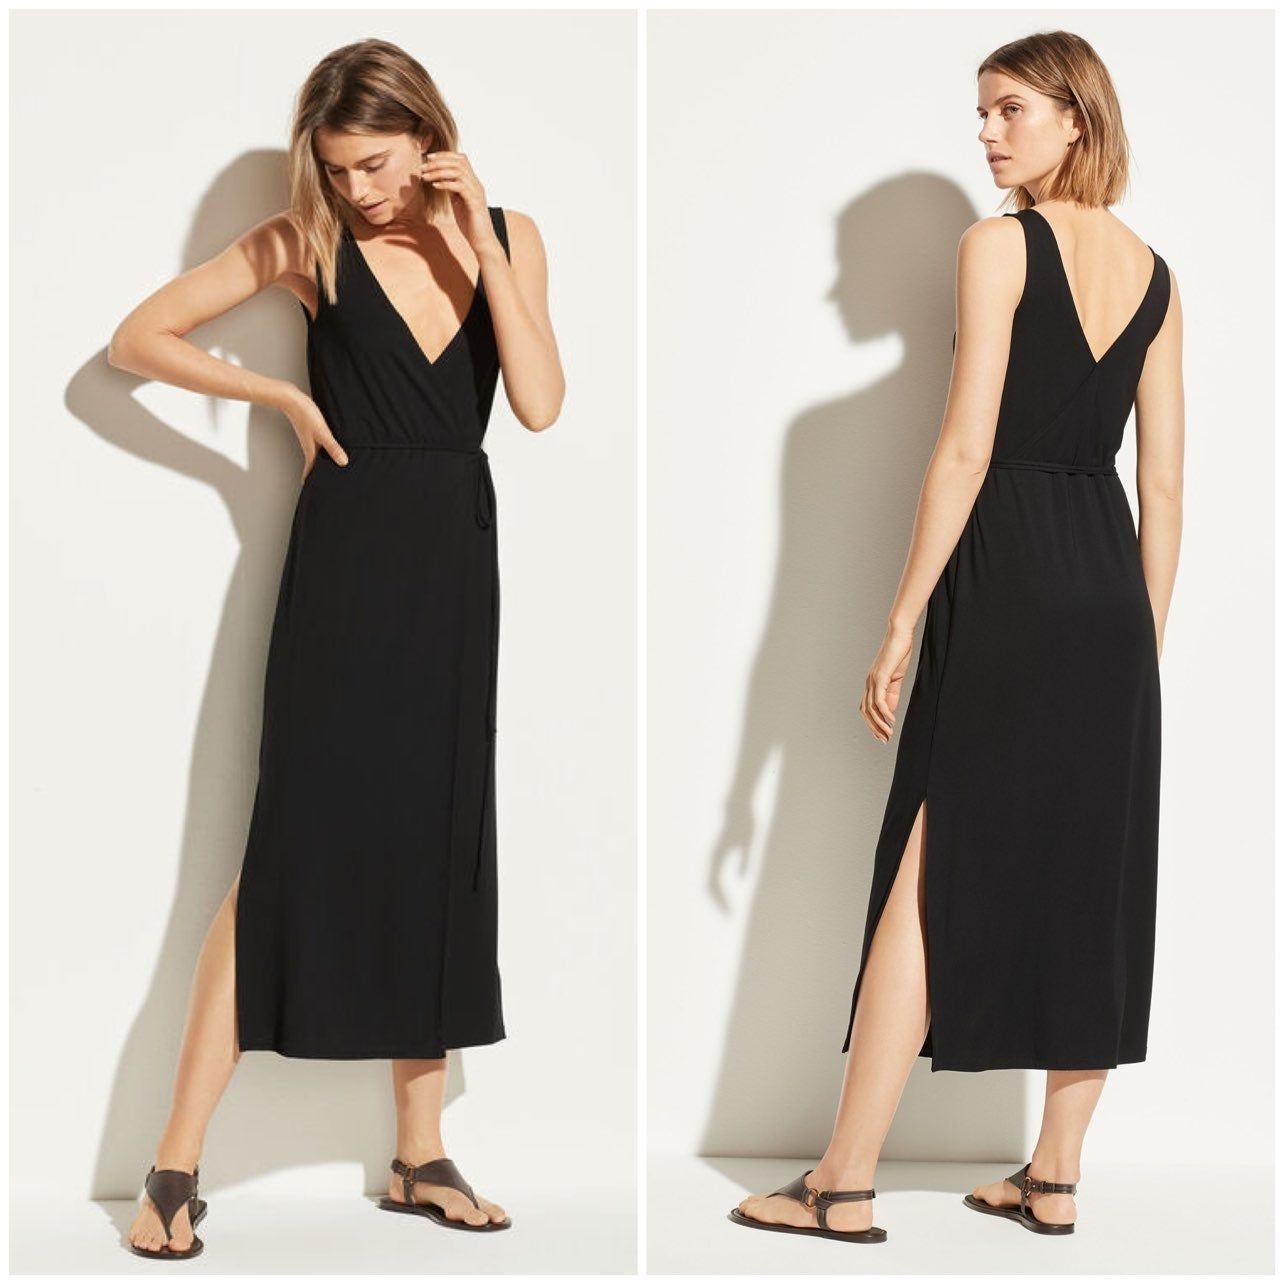 Vince V Neck Sleeveless Wrap Dress Mercari In 2021 Sleeveless Wrap Dress Wrap Dress Beautiful Blouses [ 1284 x 1284 Pixel ]